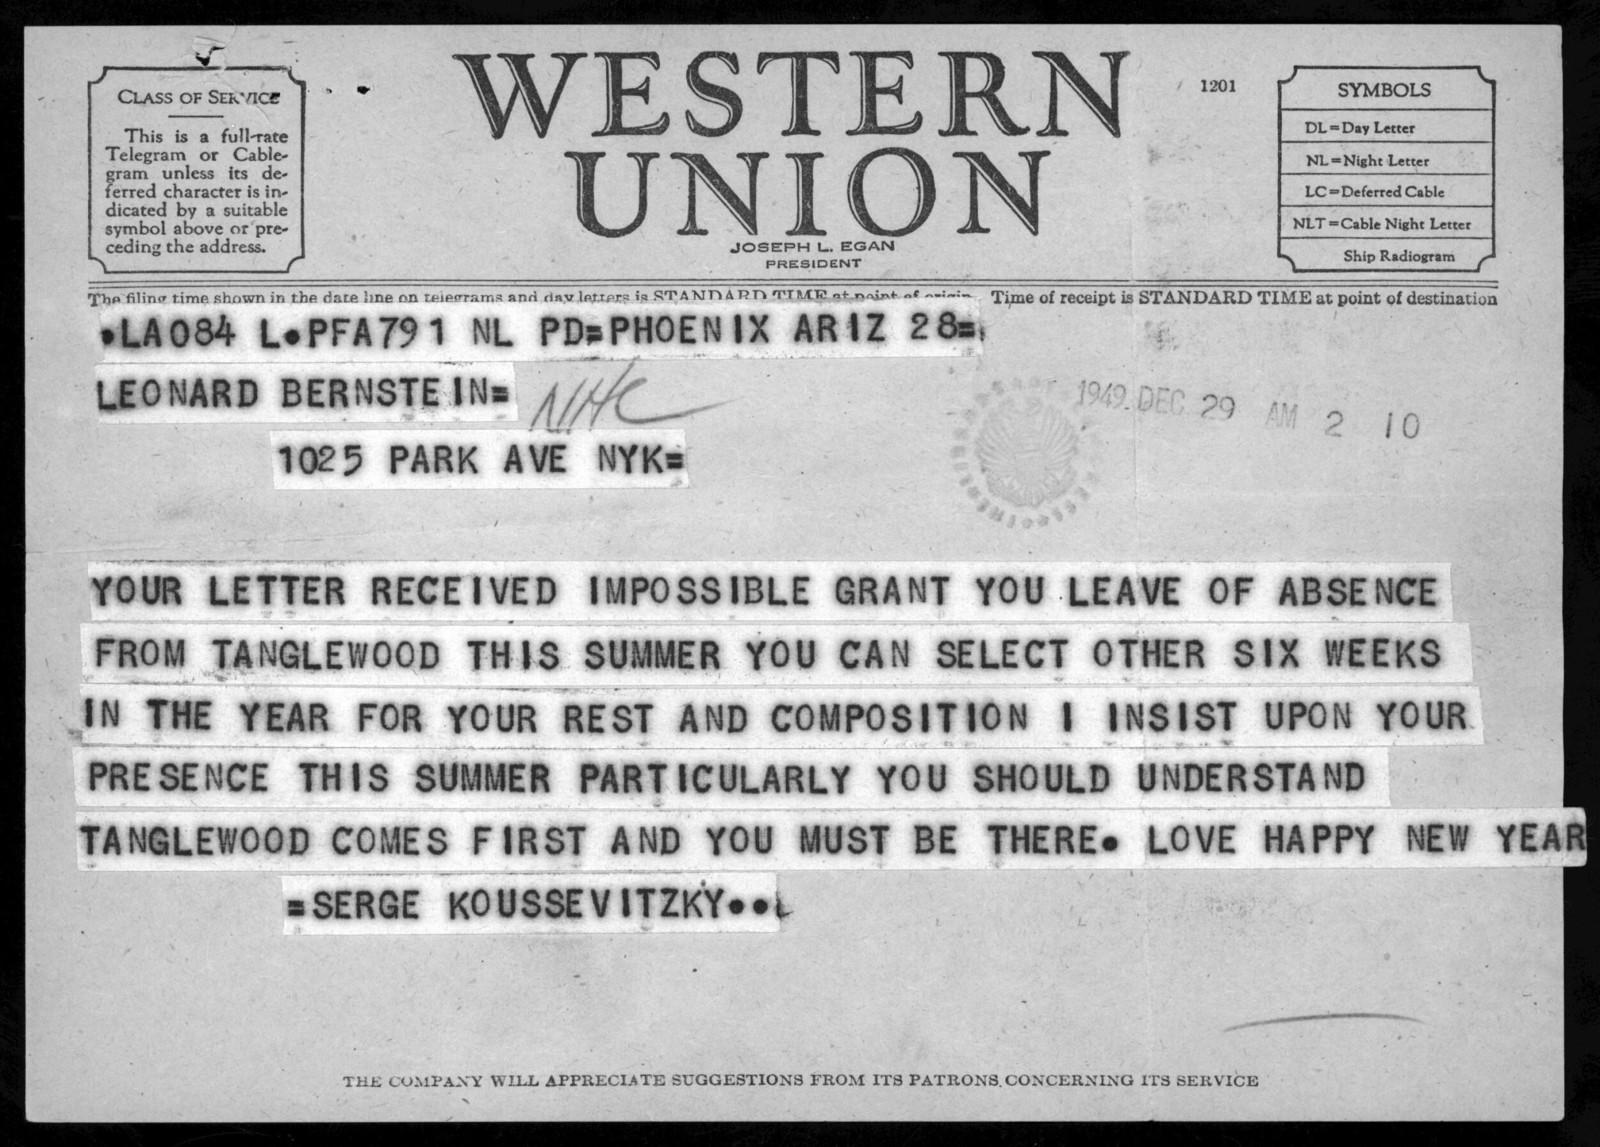 Letter from Serge Koussevitzky to Leonard Bernstein, 1949